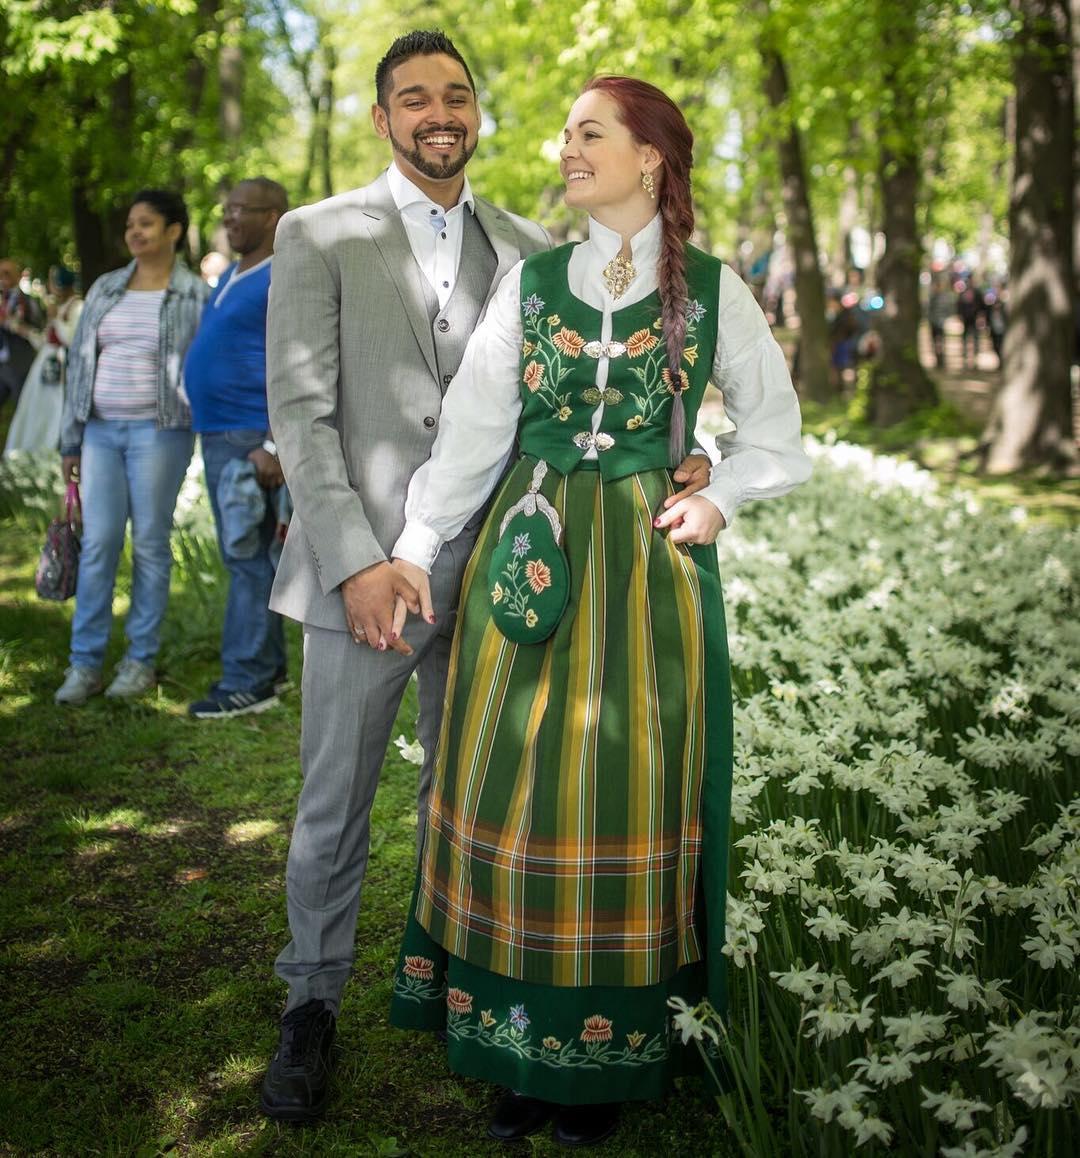 Trajes tradicionais de casamento na Noruega